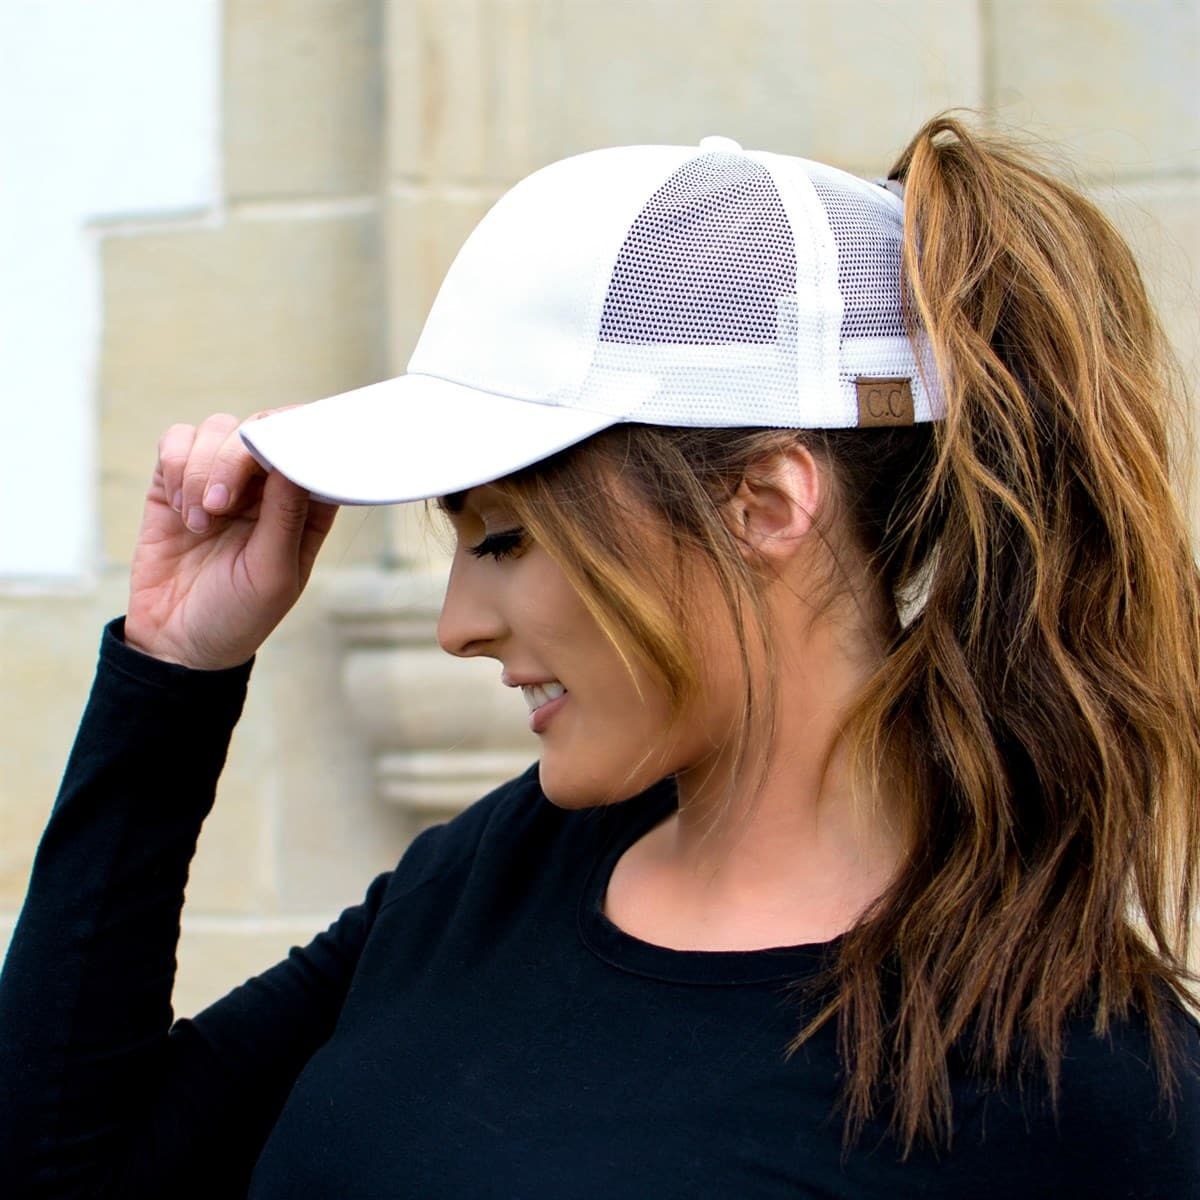 C C Top Knot Trucker Hats Baseball Hat Hairstyles Hat Hairstyles Baseball Cap Hairstyles